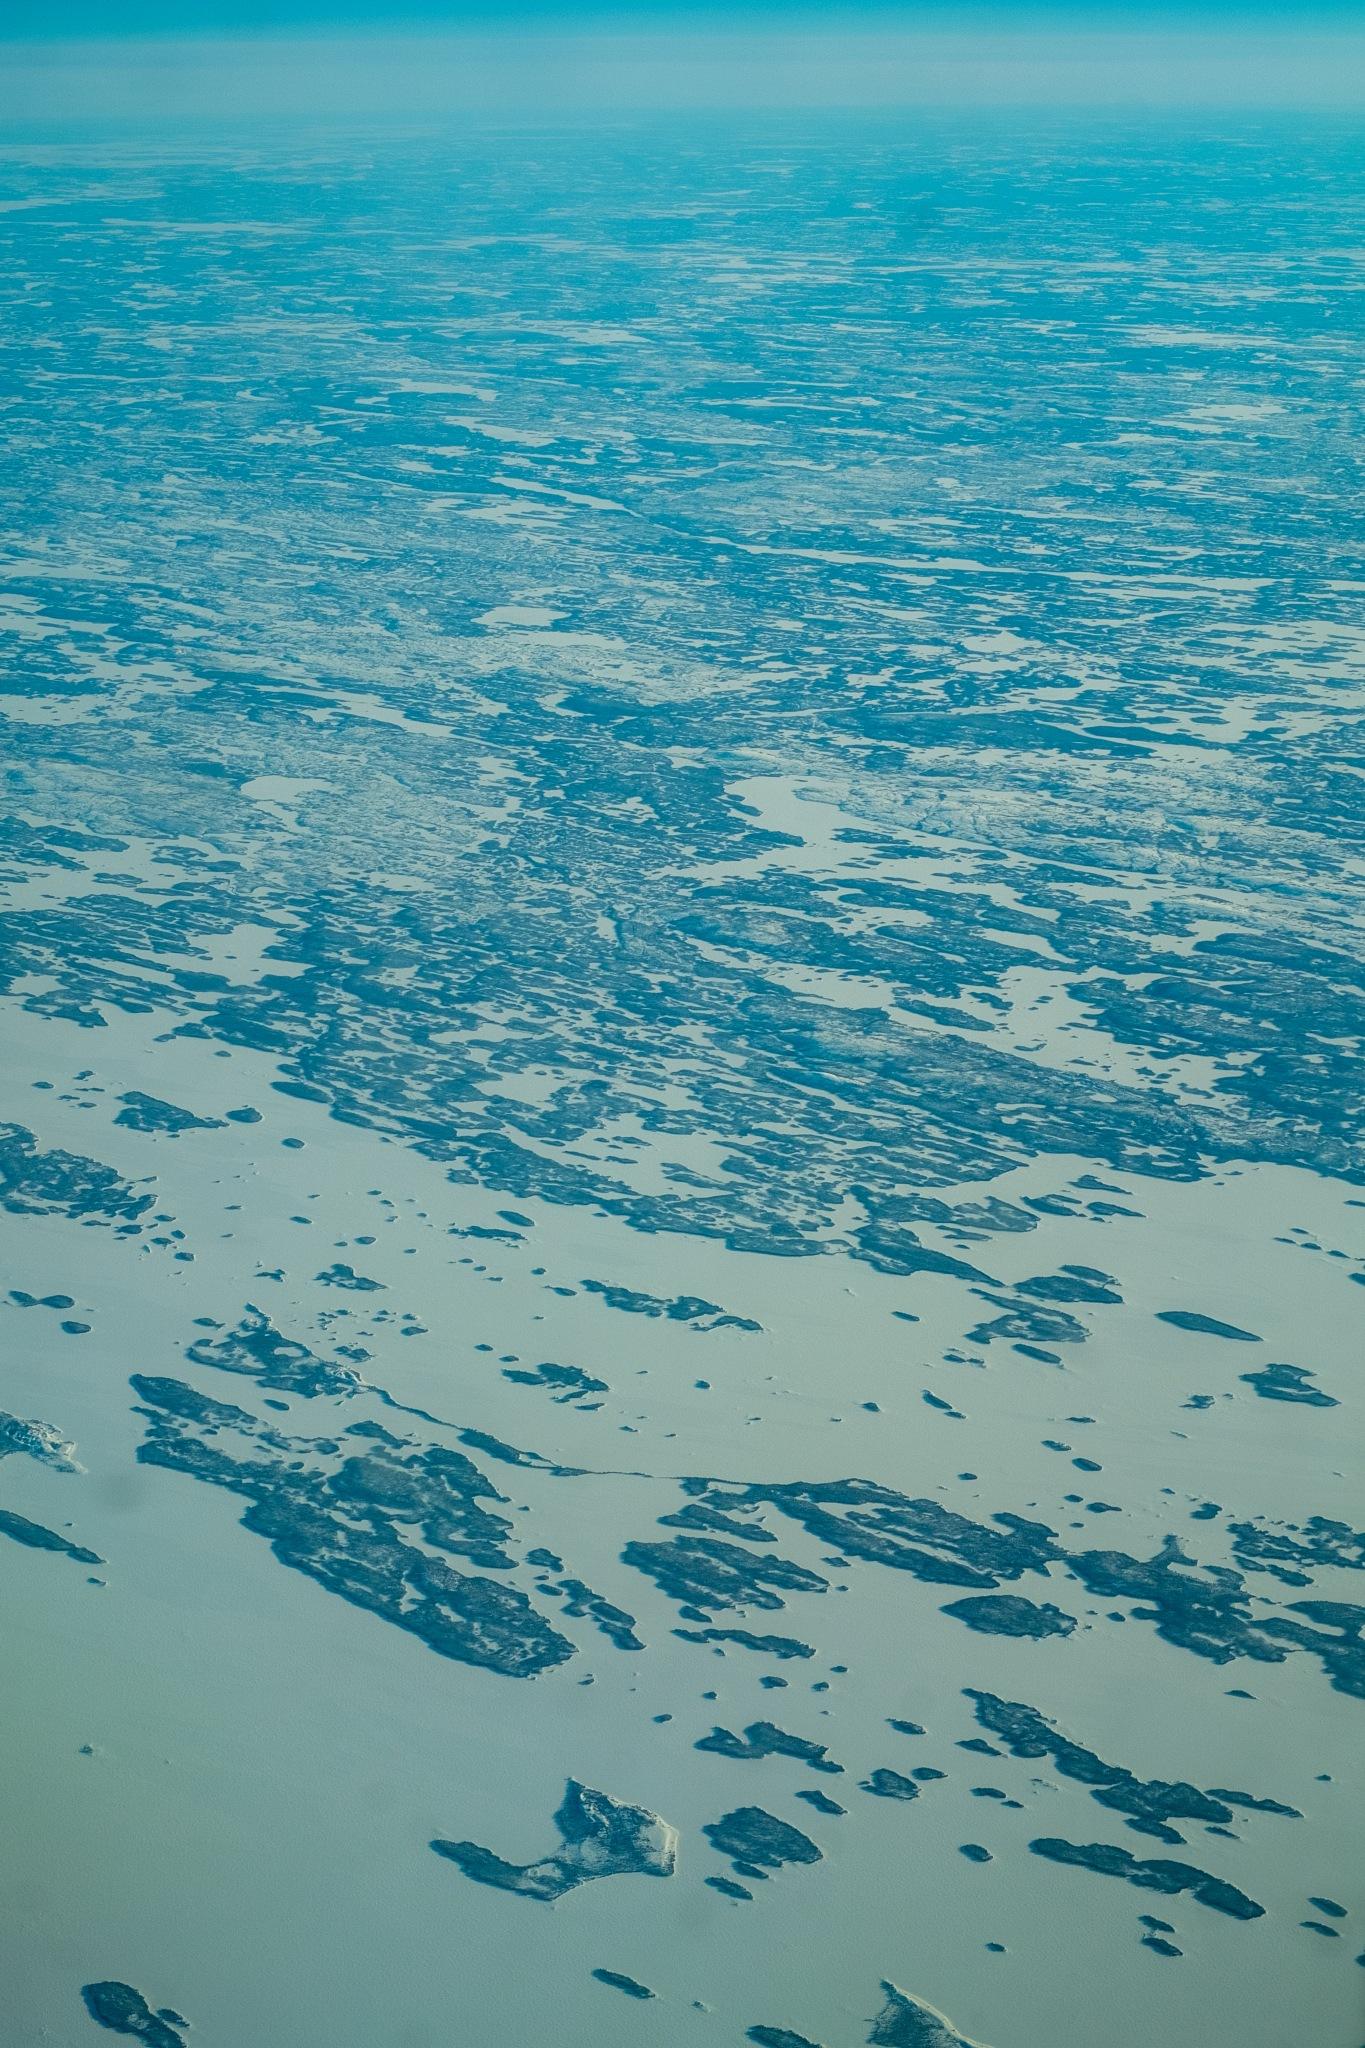 Greenland plains by DimaShevchuk